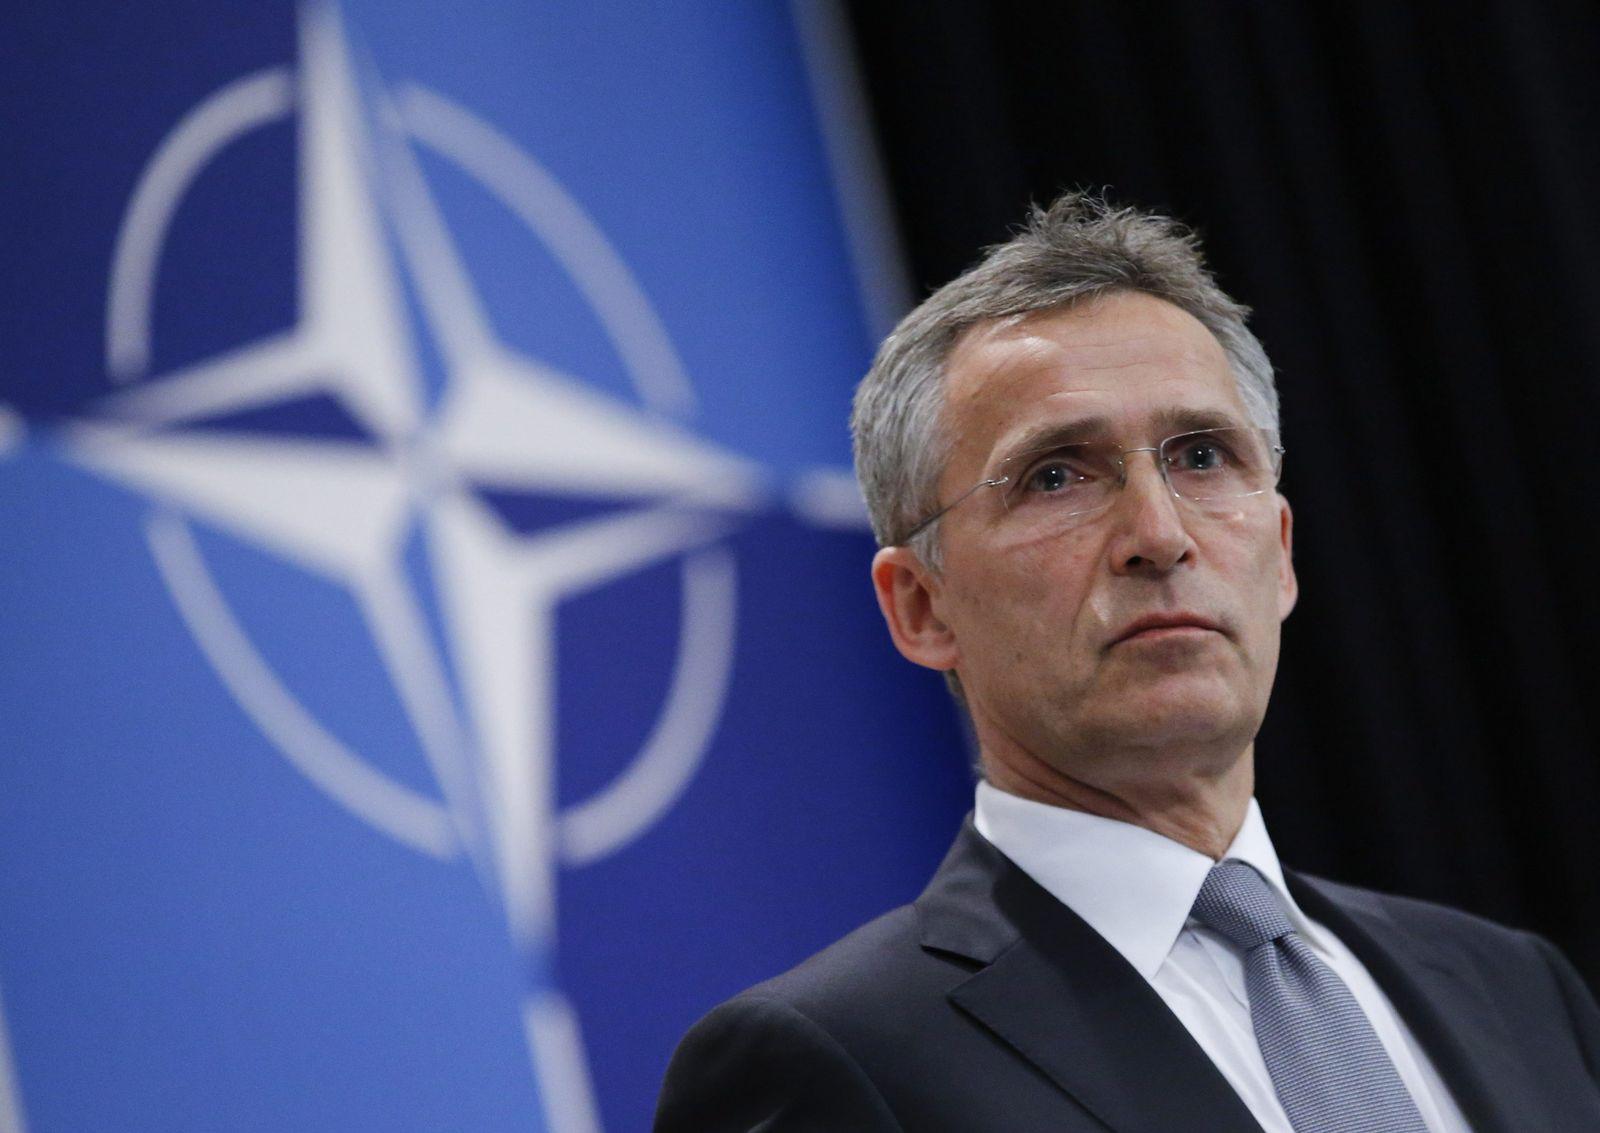 NATO Secretary General Jens Stoltenberg in Brussels